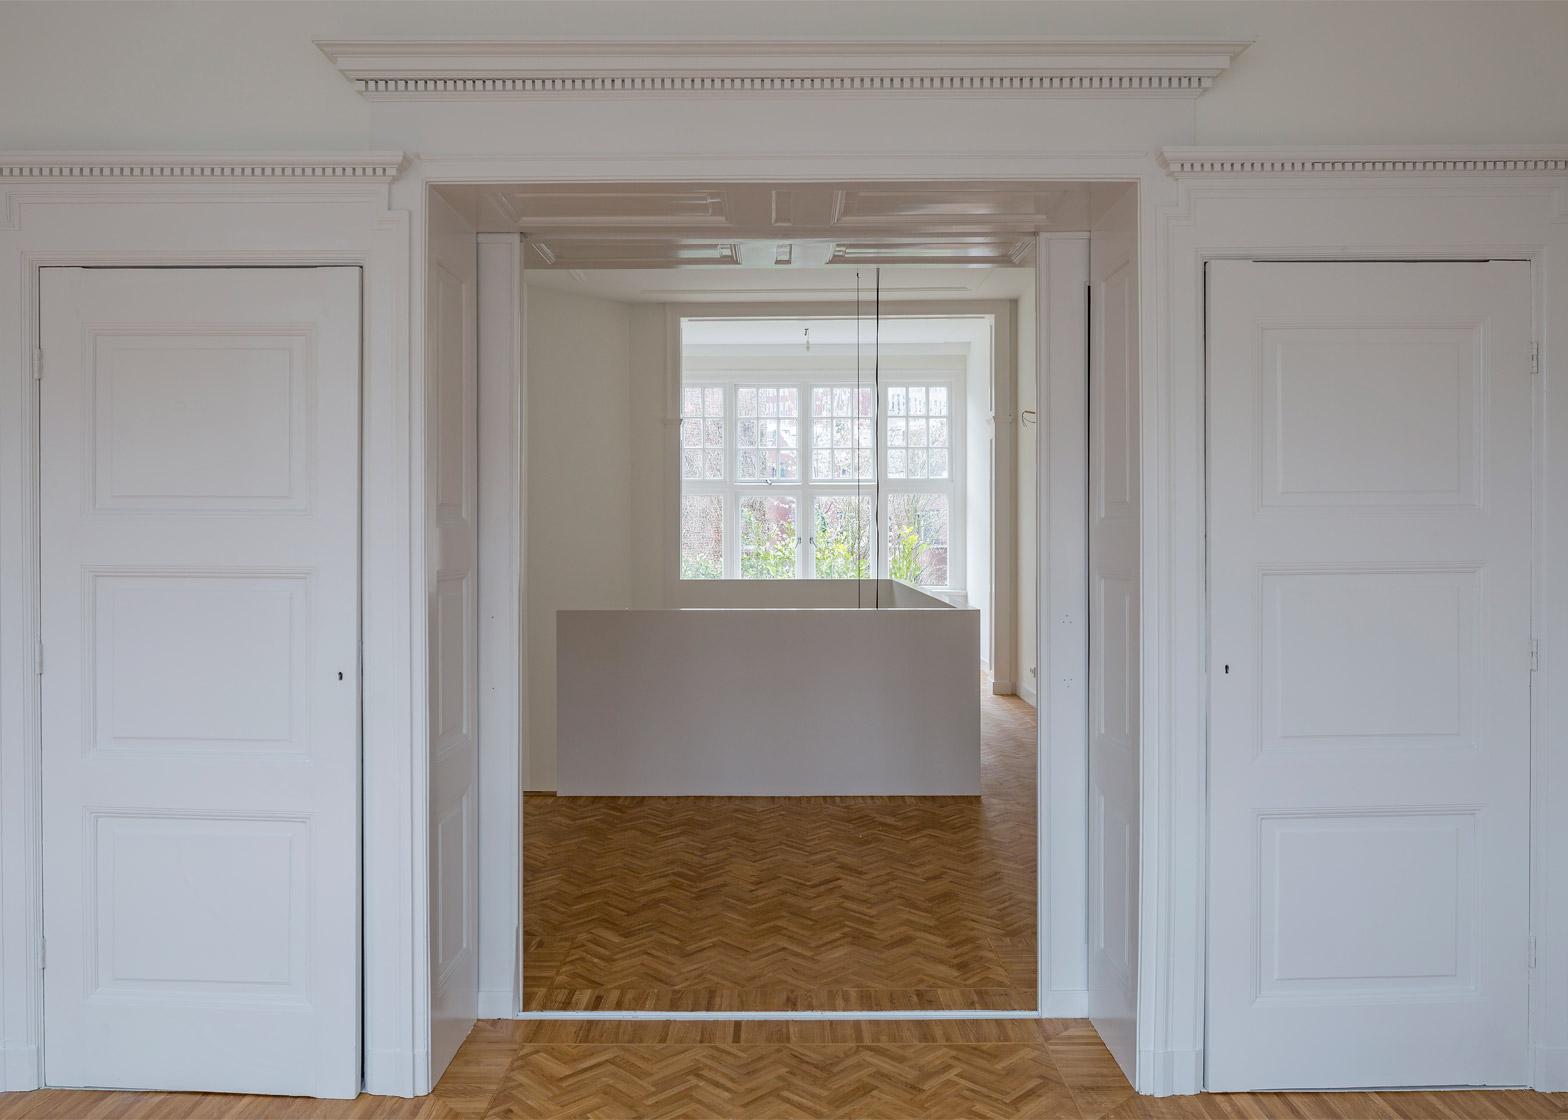 architecture_renovation_project_hague-interior_house__design_studia_interiors_osnovadesign_osnova_poltava_04